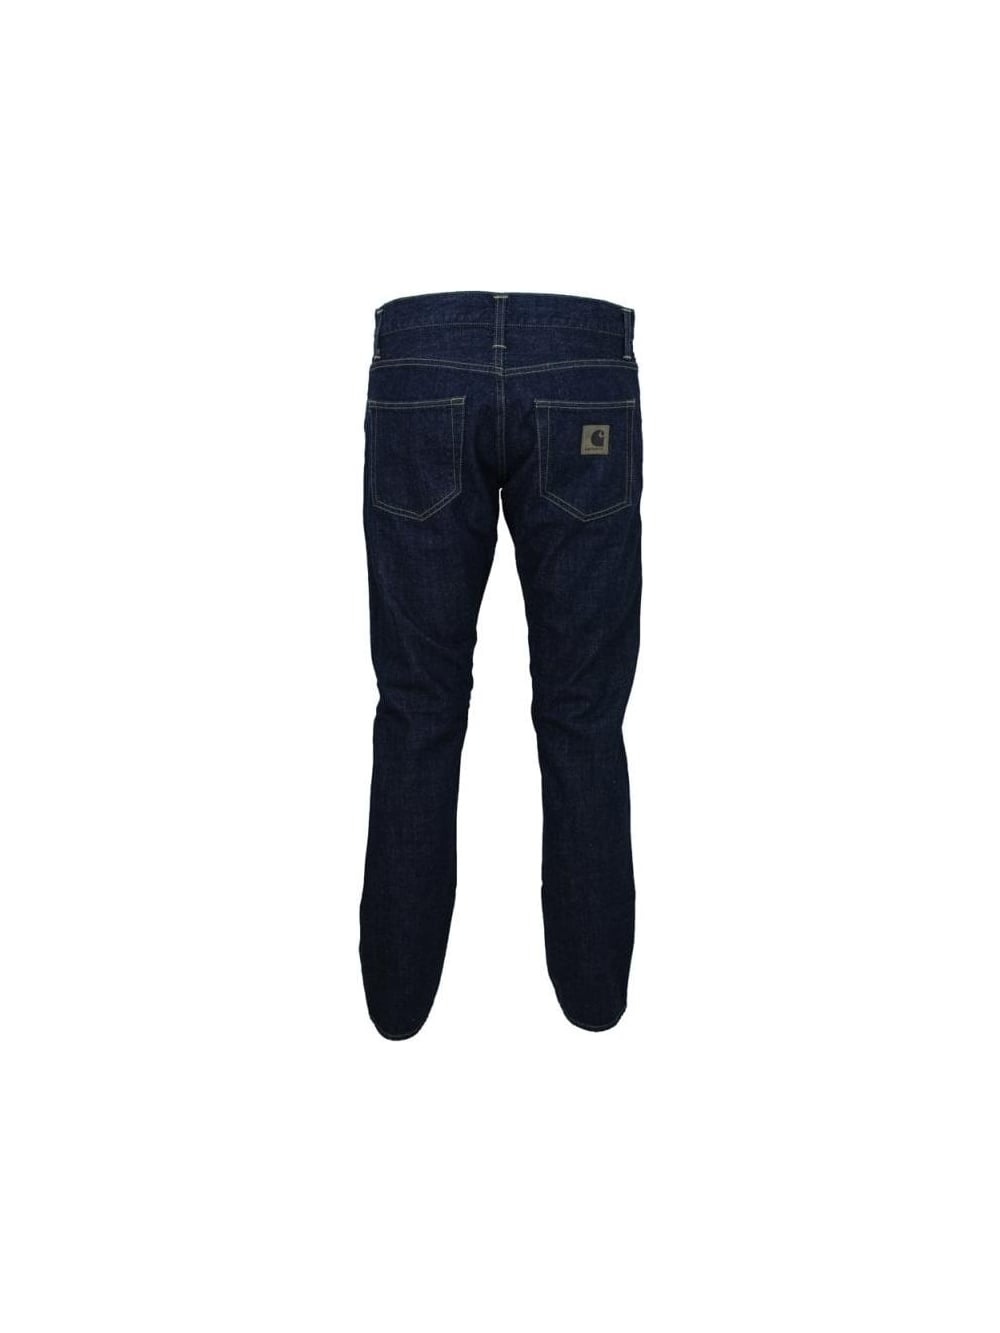 carhartt klondike pant ii in blue rinsed northern threads. Black Bedroom Furniture Sets. Home Design Ideas